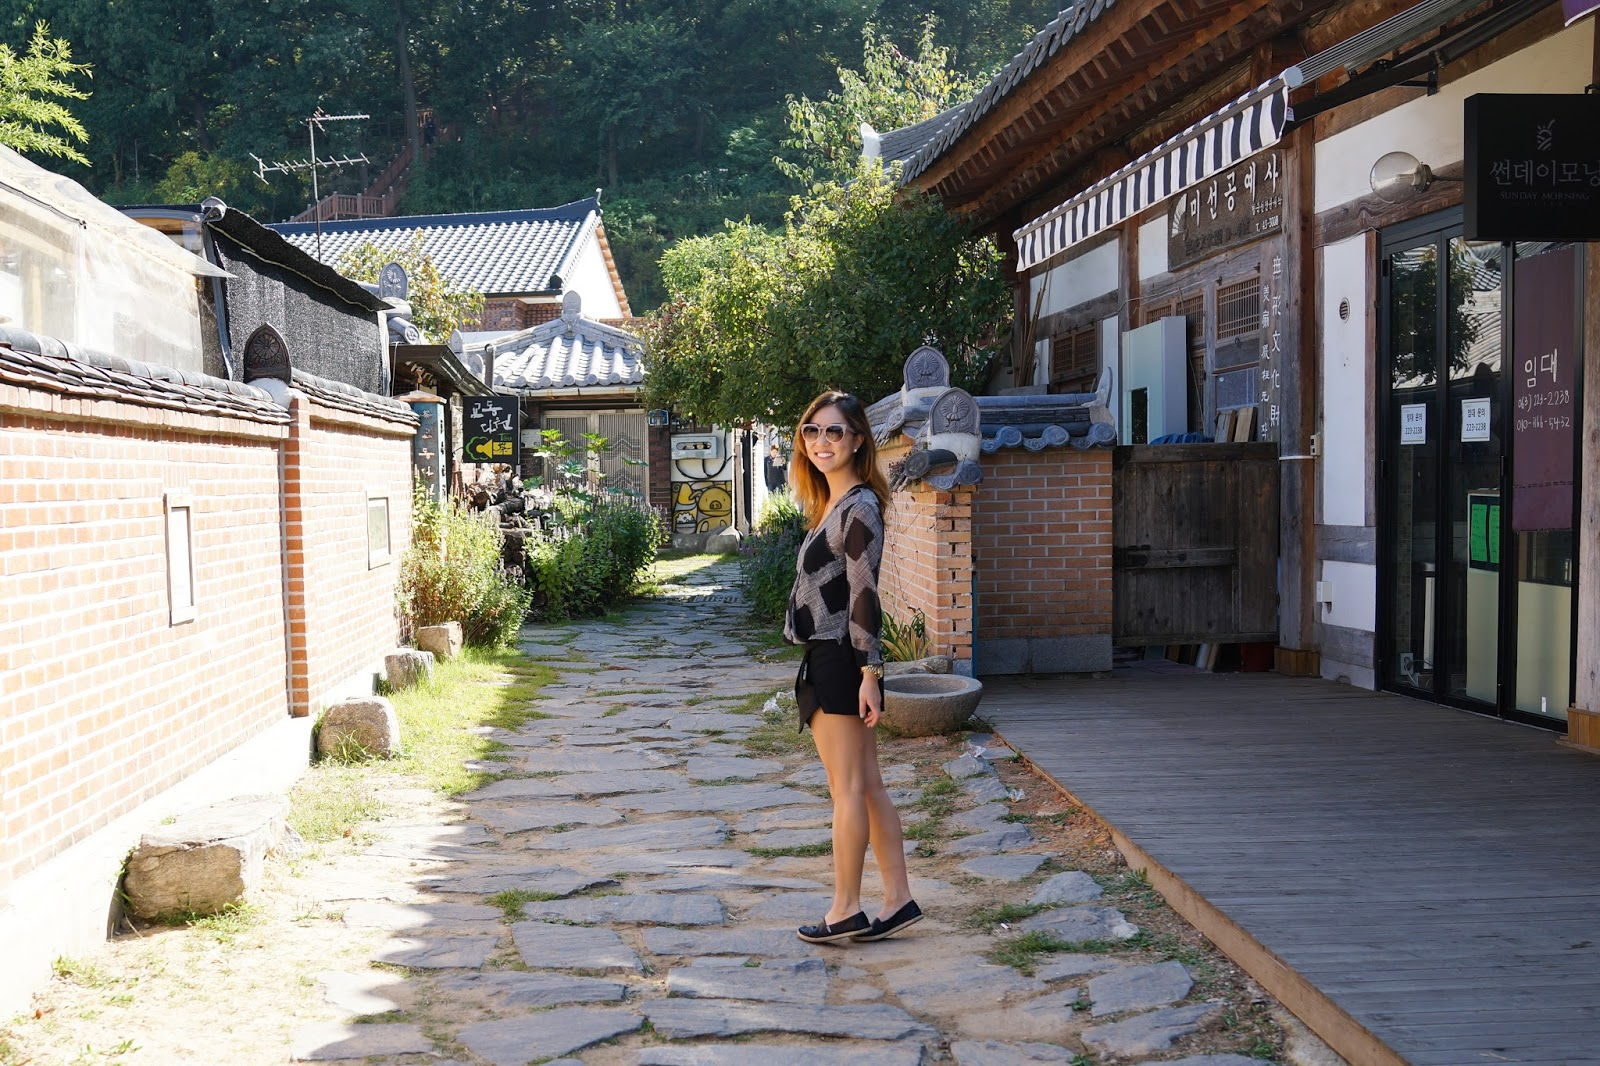 Salming Damen Trail T3 Rosa Textil und Kunststoff Laufschuhe